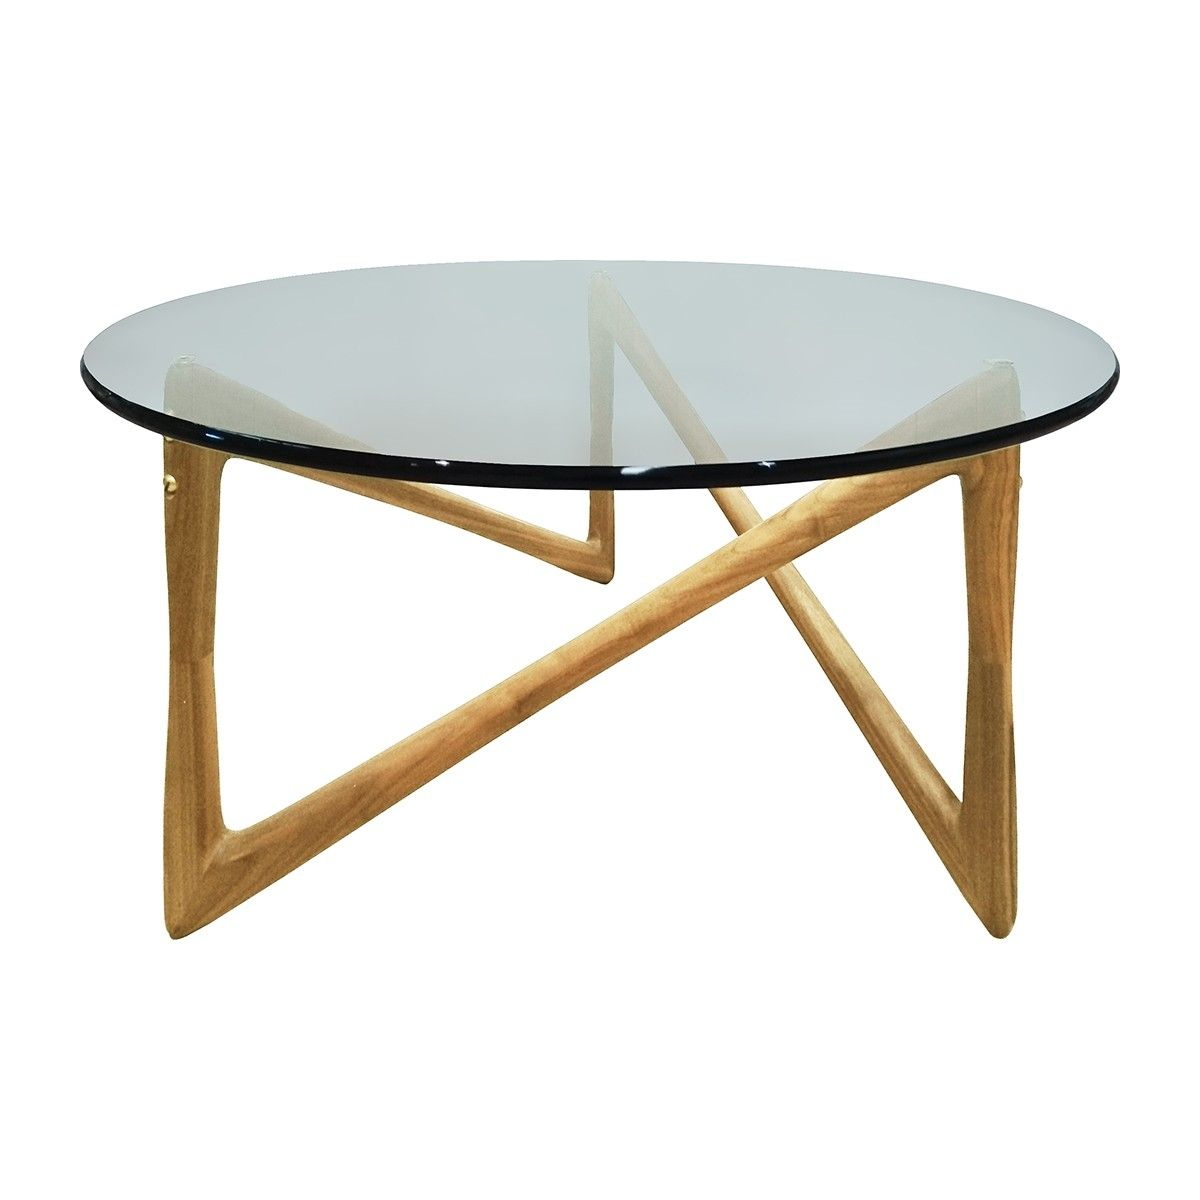 Gigi Coffee Table Oak 90cm Coffee Table Latest Coffee Tables Coffee Table Pictures [ 1200 x 1200 Pixel ]